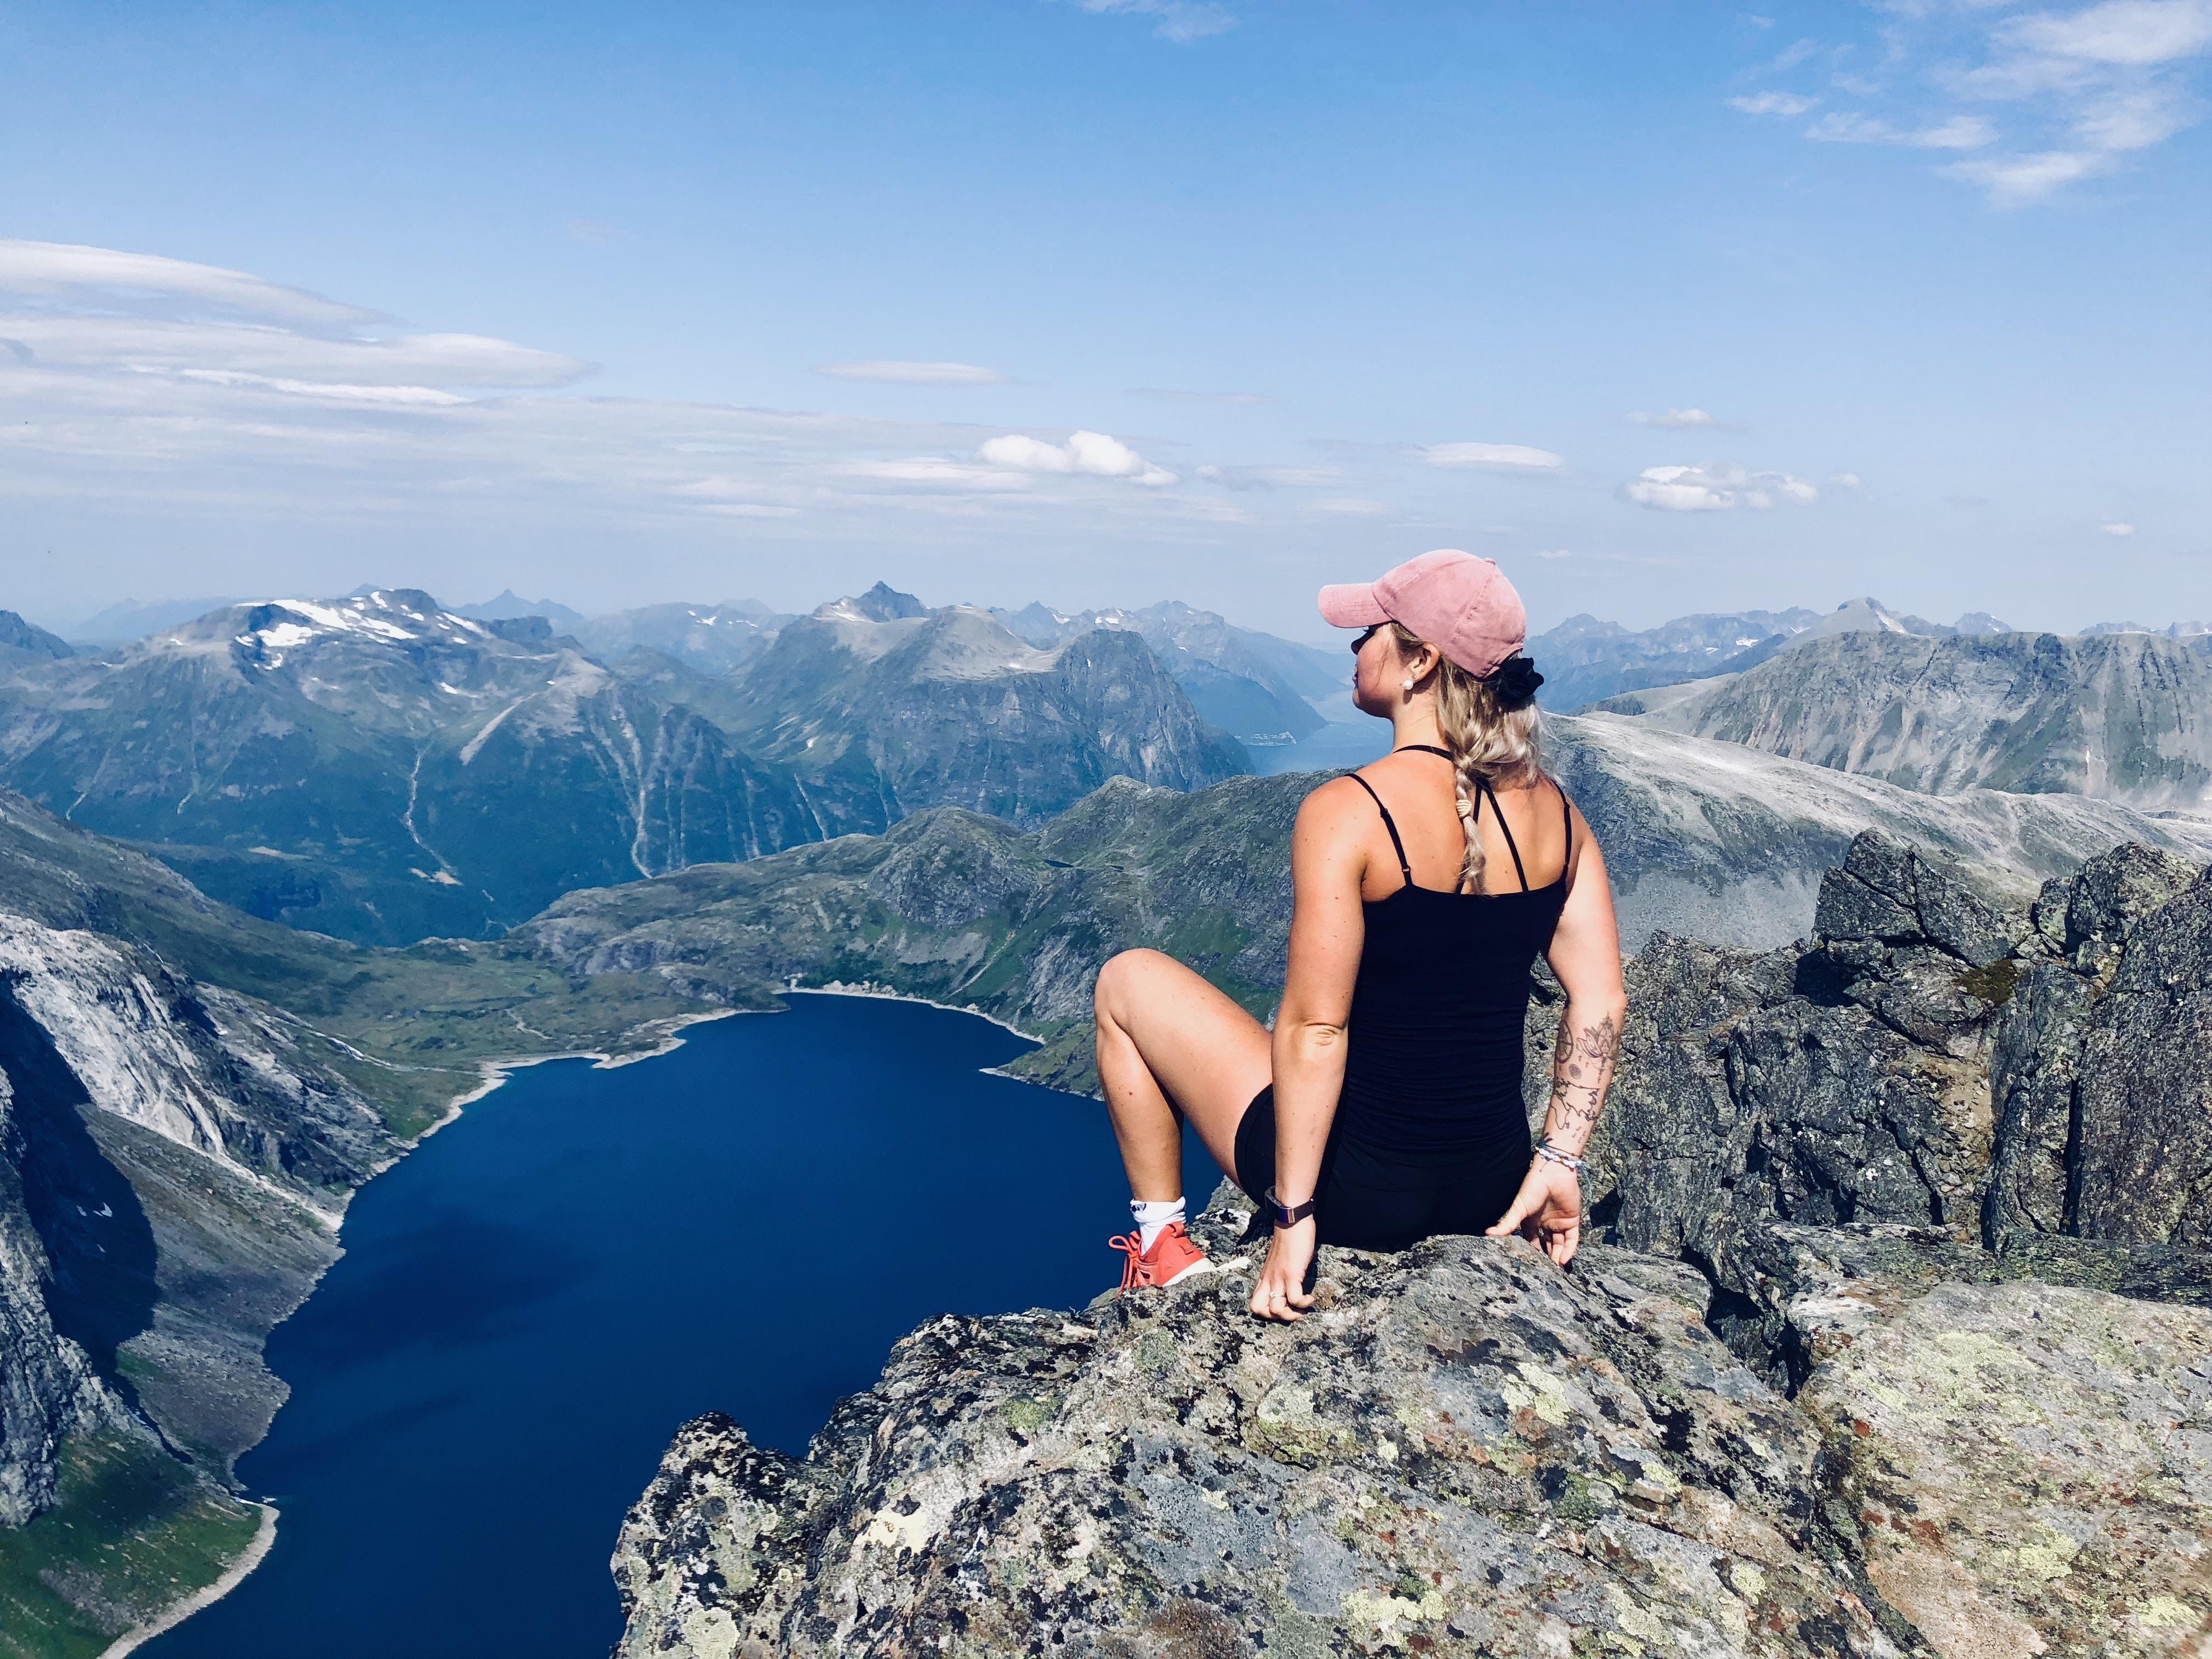 woman sitting on mountain cliff